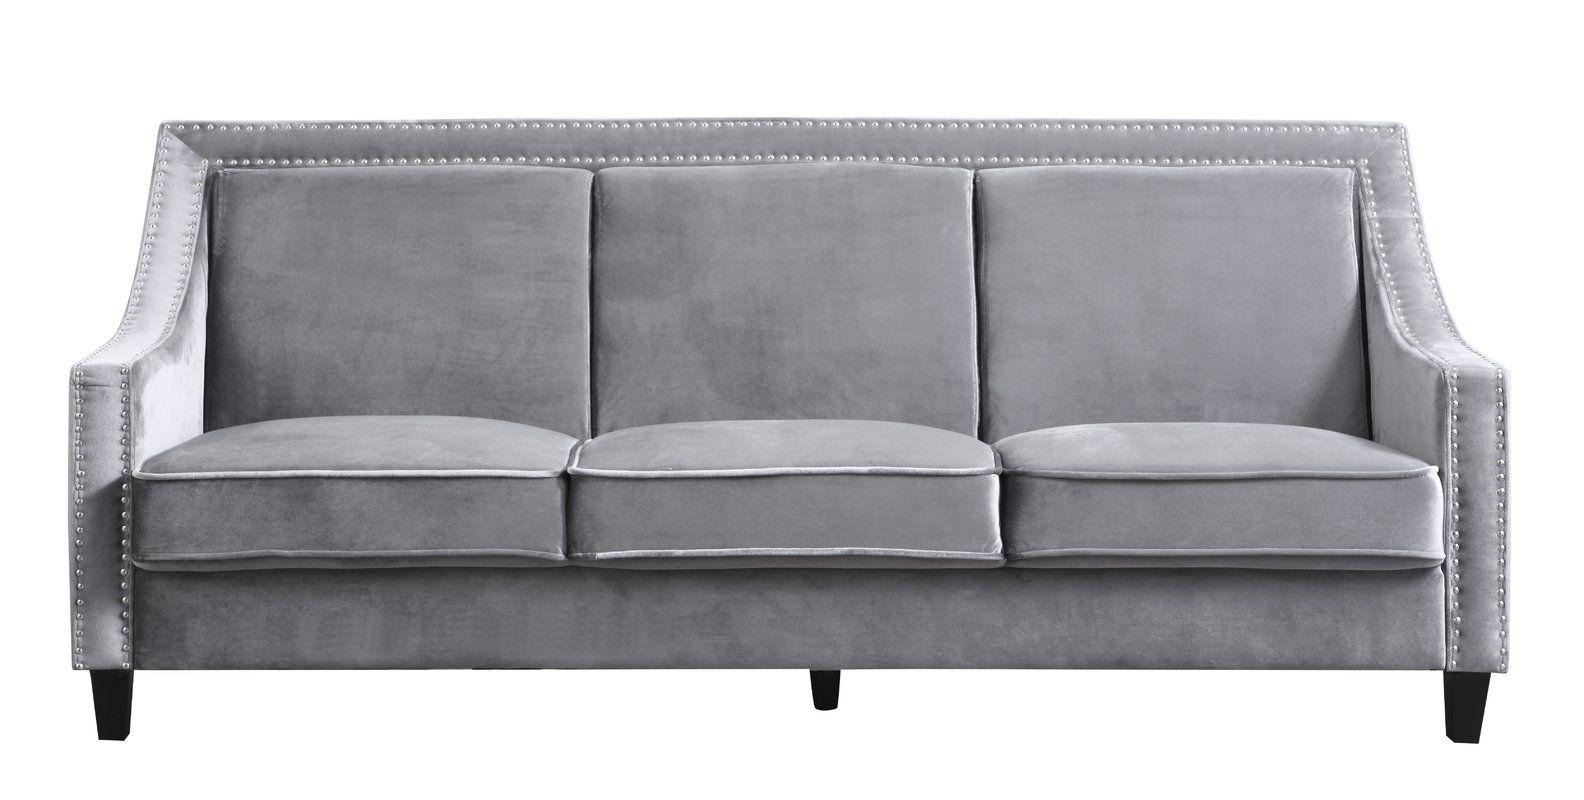 Trista Nailhead Trim Wood Legs Couch Sofa In 2020 Modern Couch Nailhead Sofa Wood Legs